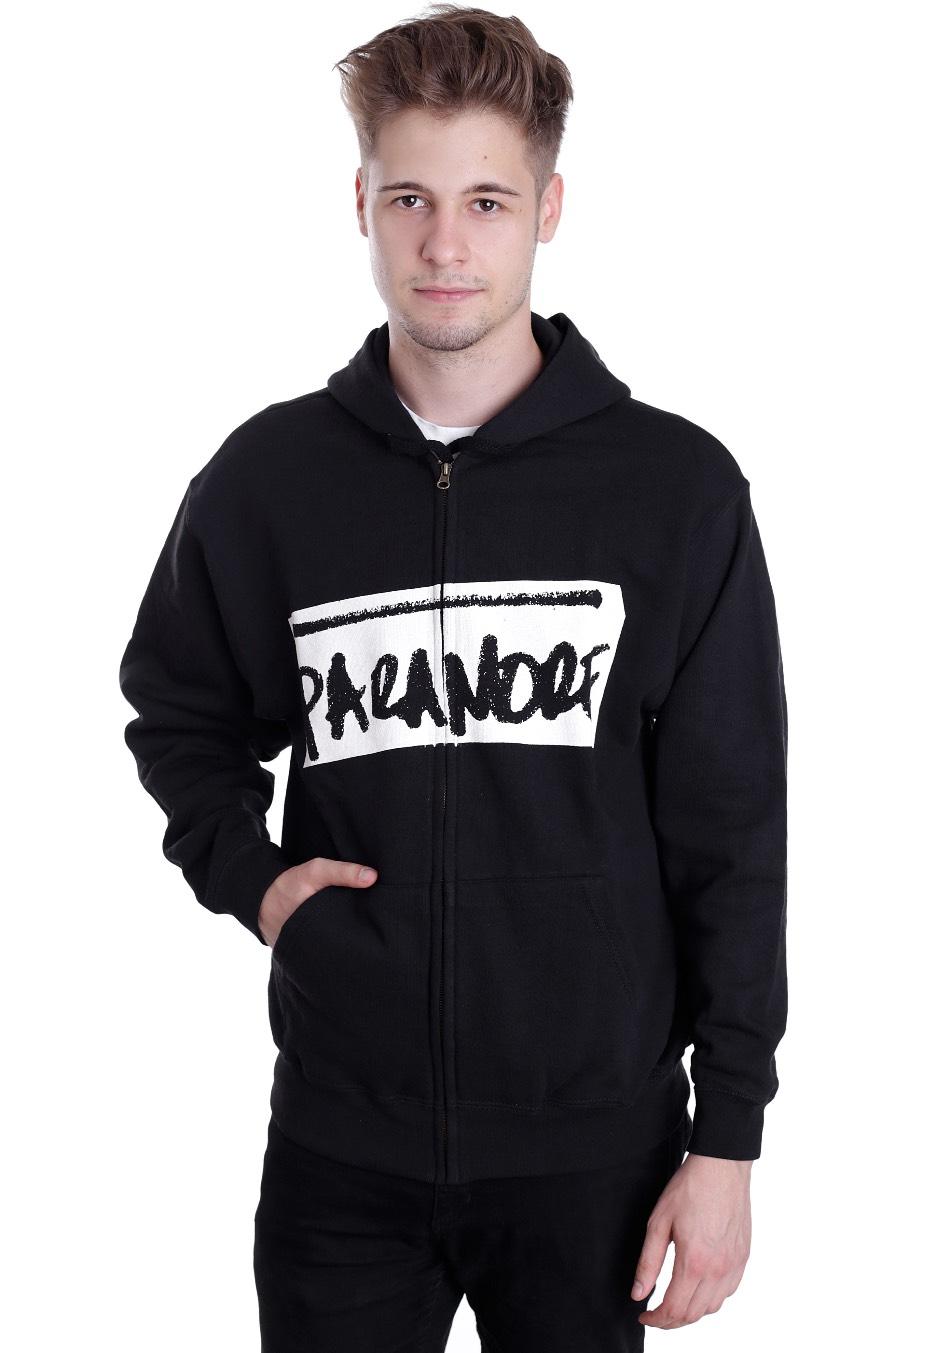 Paramore - Scribble - Zipper - Official Rock Merchandise ... Paramore Nederland